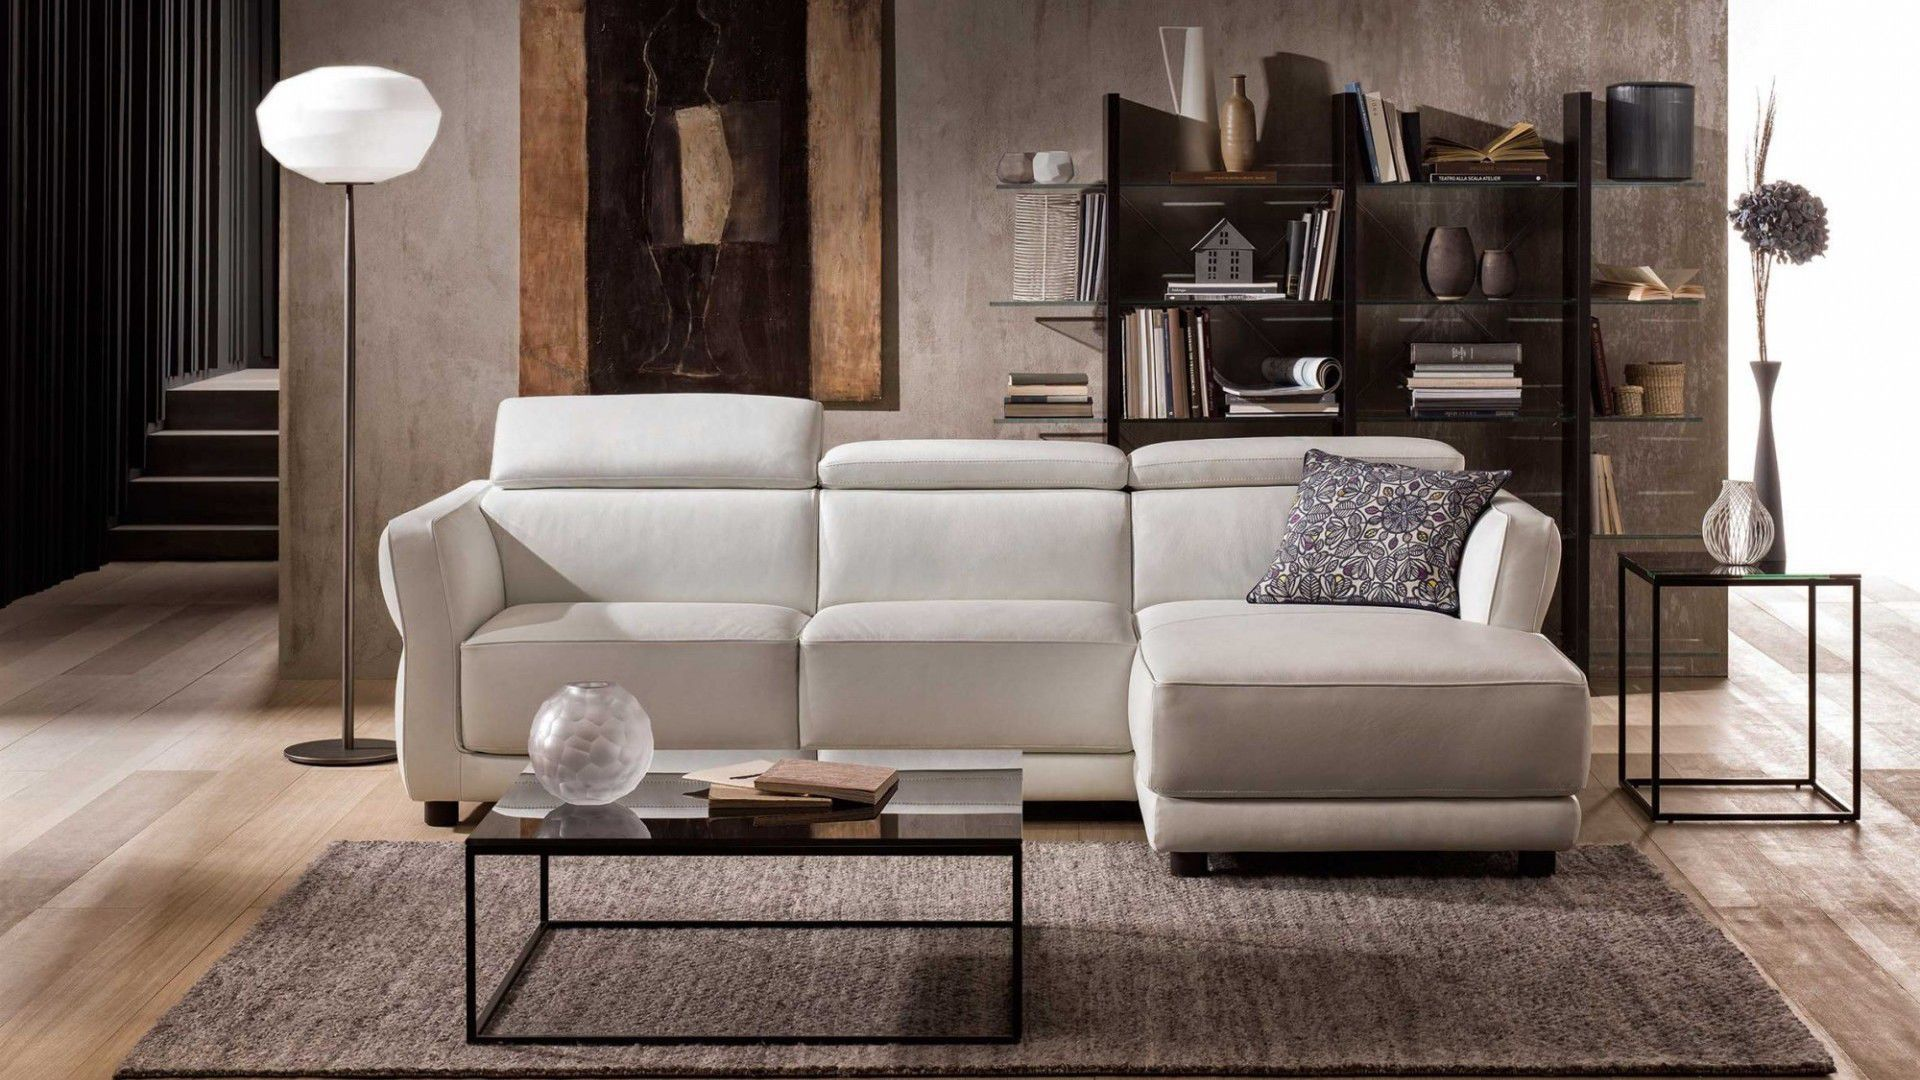 Modular sofa bed contemporary leather NOTTURNO NATUZZI